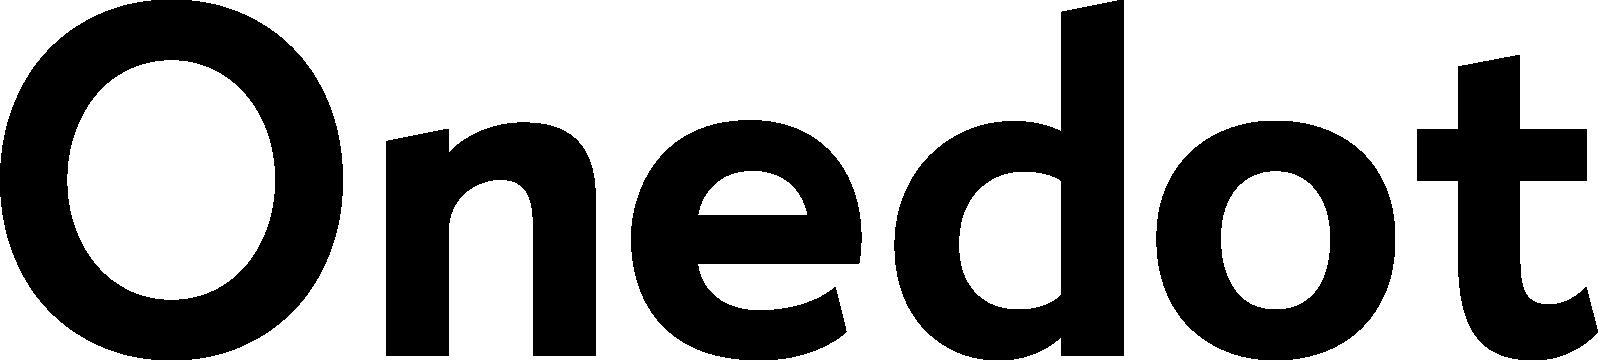 Onedot株式会社